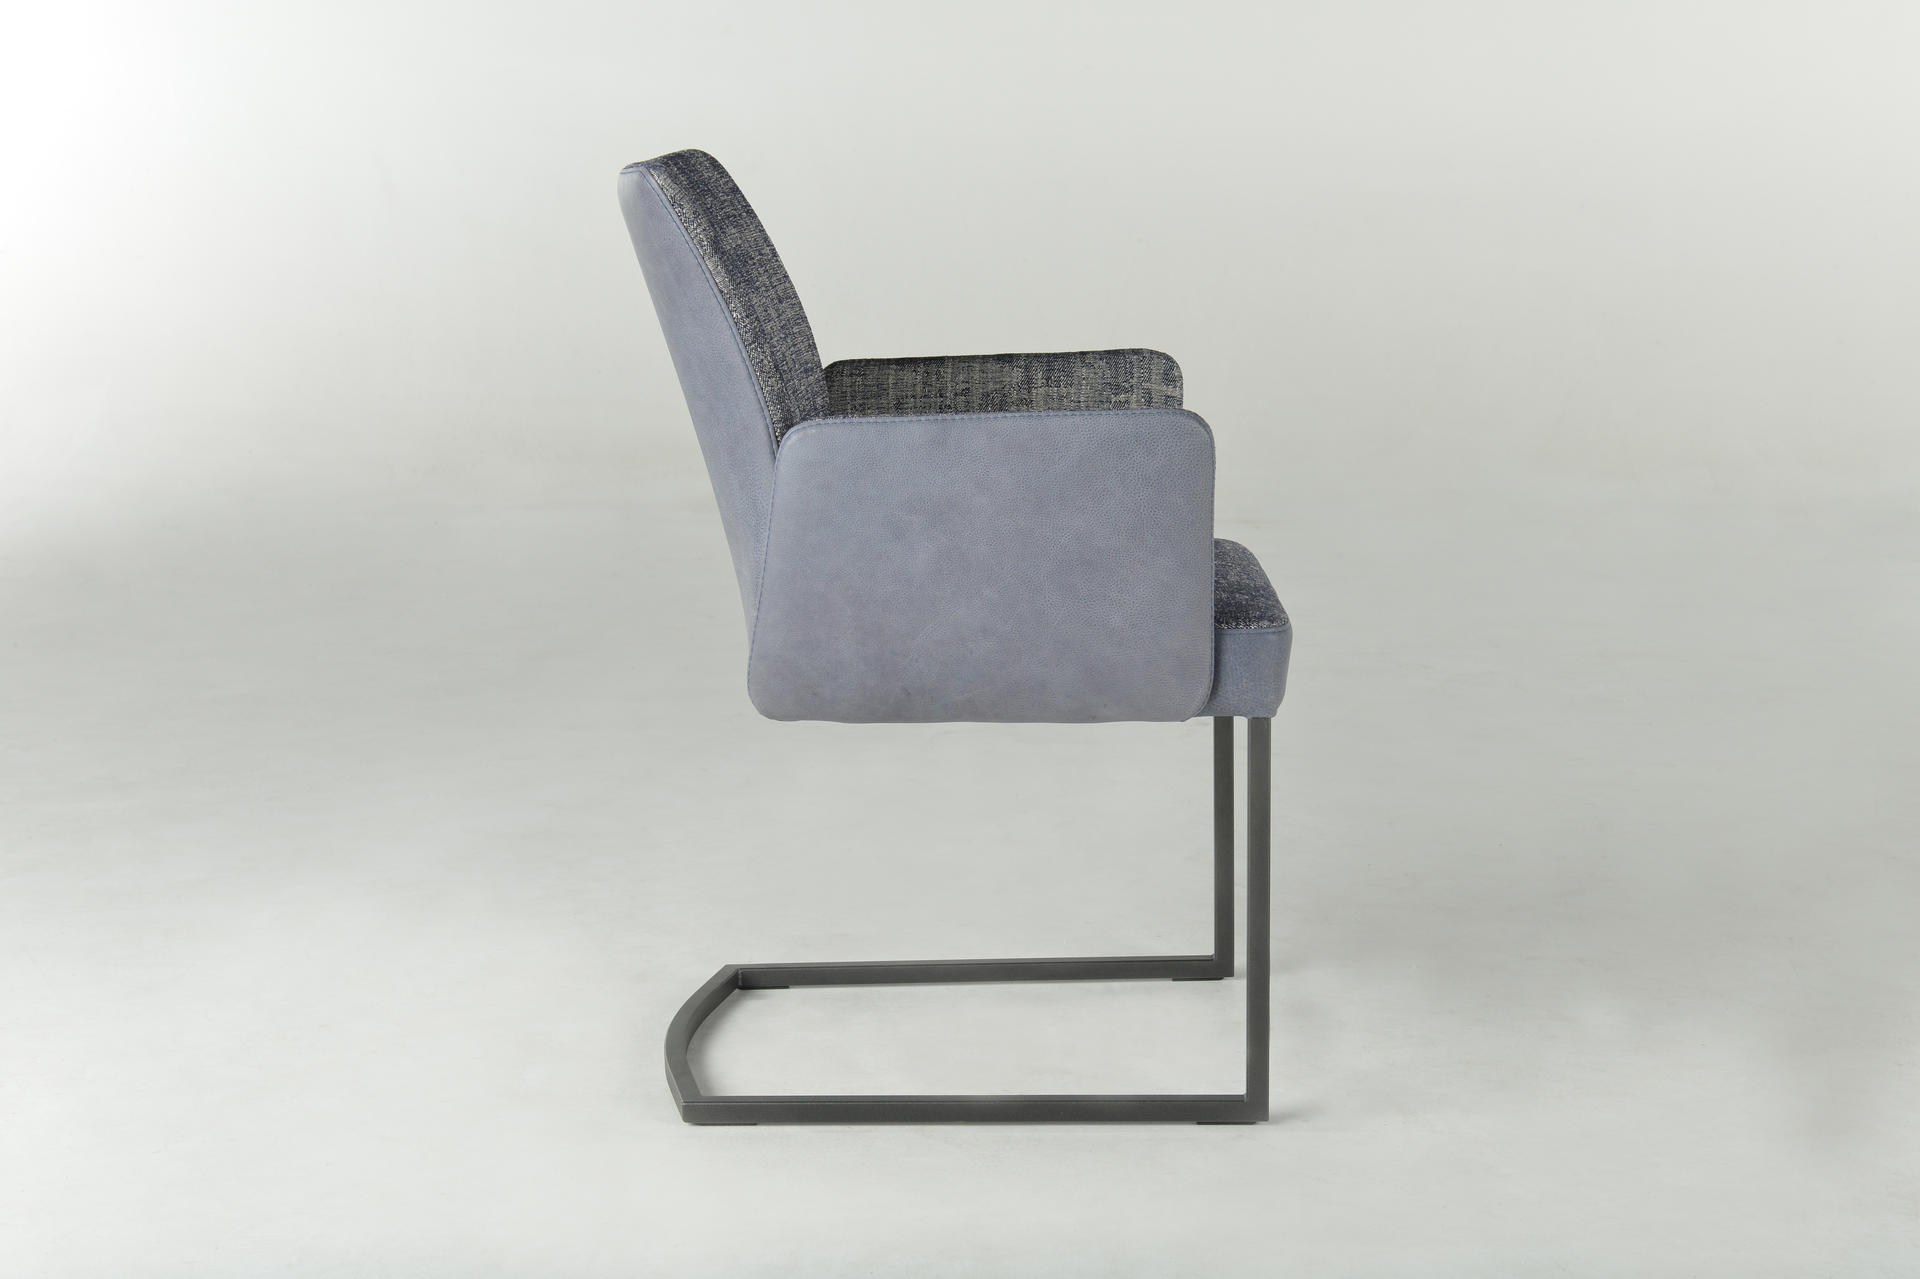 стул Ultimo, Bert Plantagie, фото 2